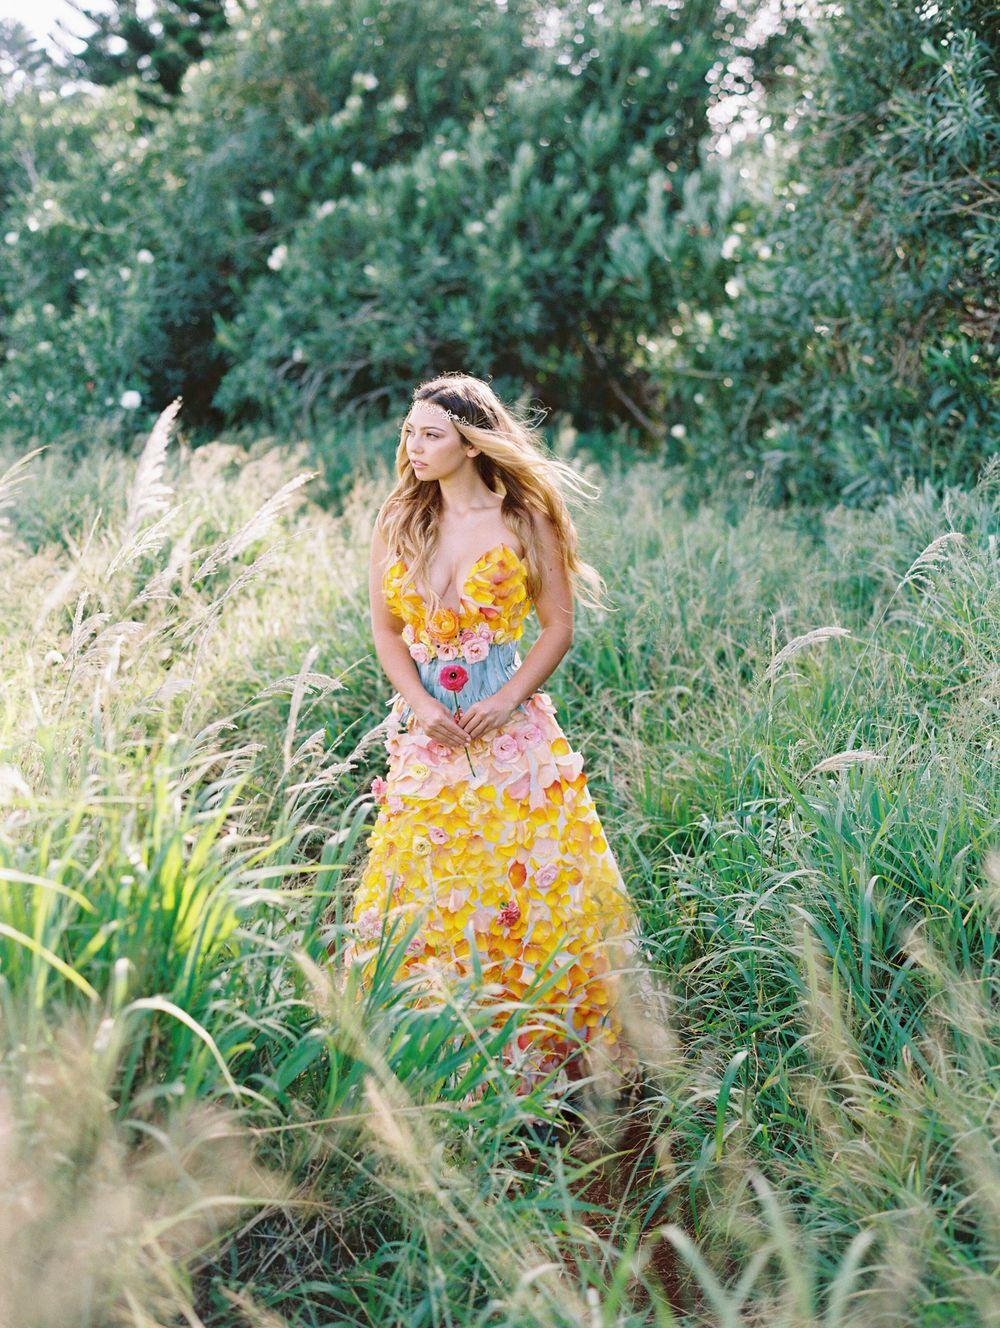 wendy.laurel.flower.dress.jpg